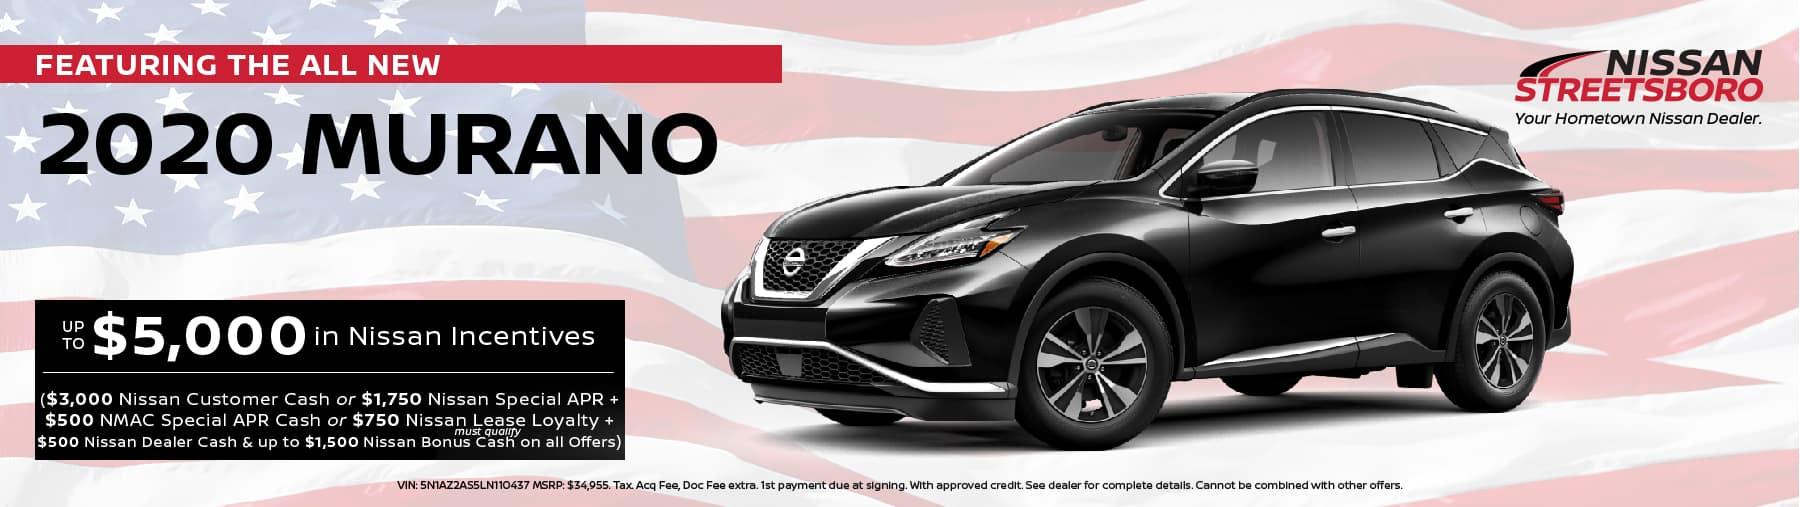 2020 Nissan Murano Incentives